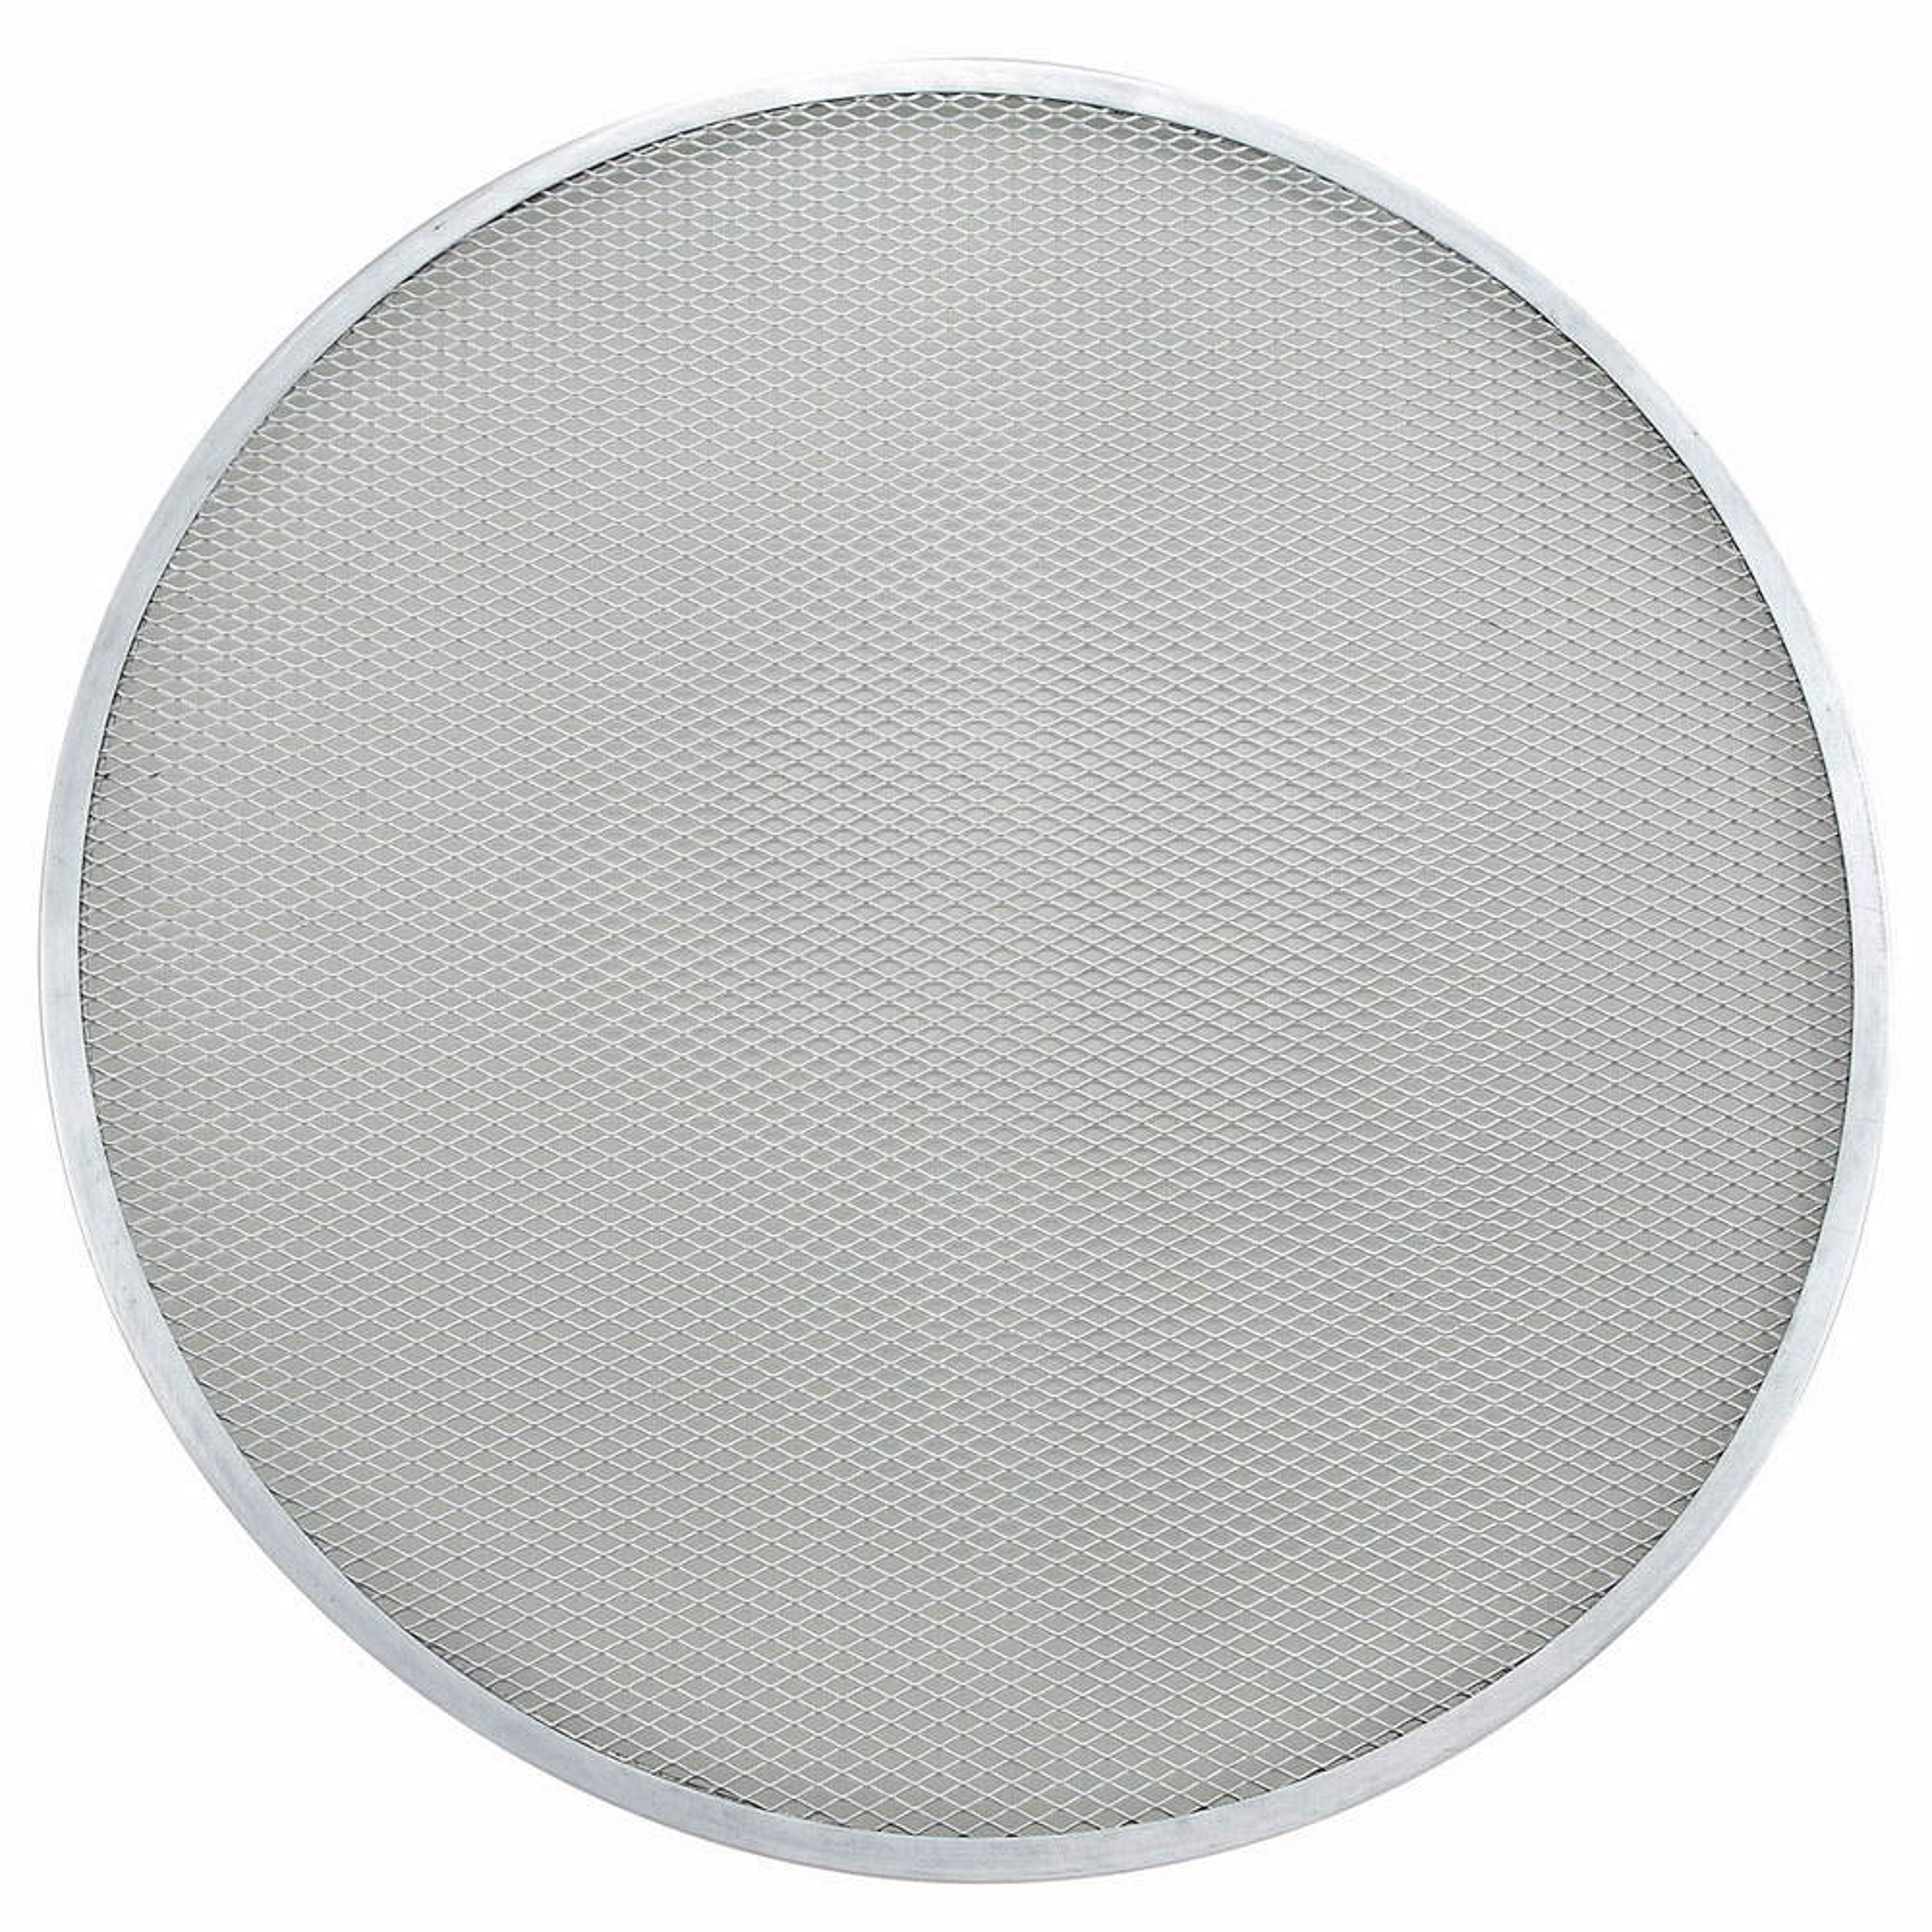 "Winco APZS-18 18"" Seamless Pizza Screen, Aluminum"